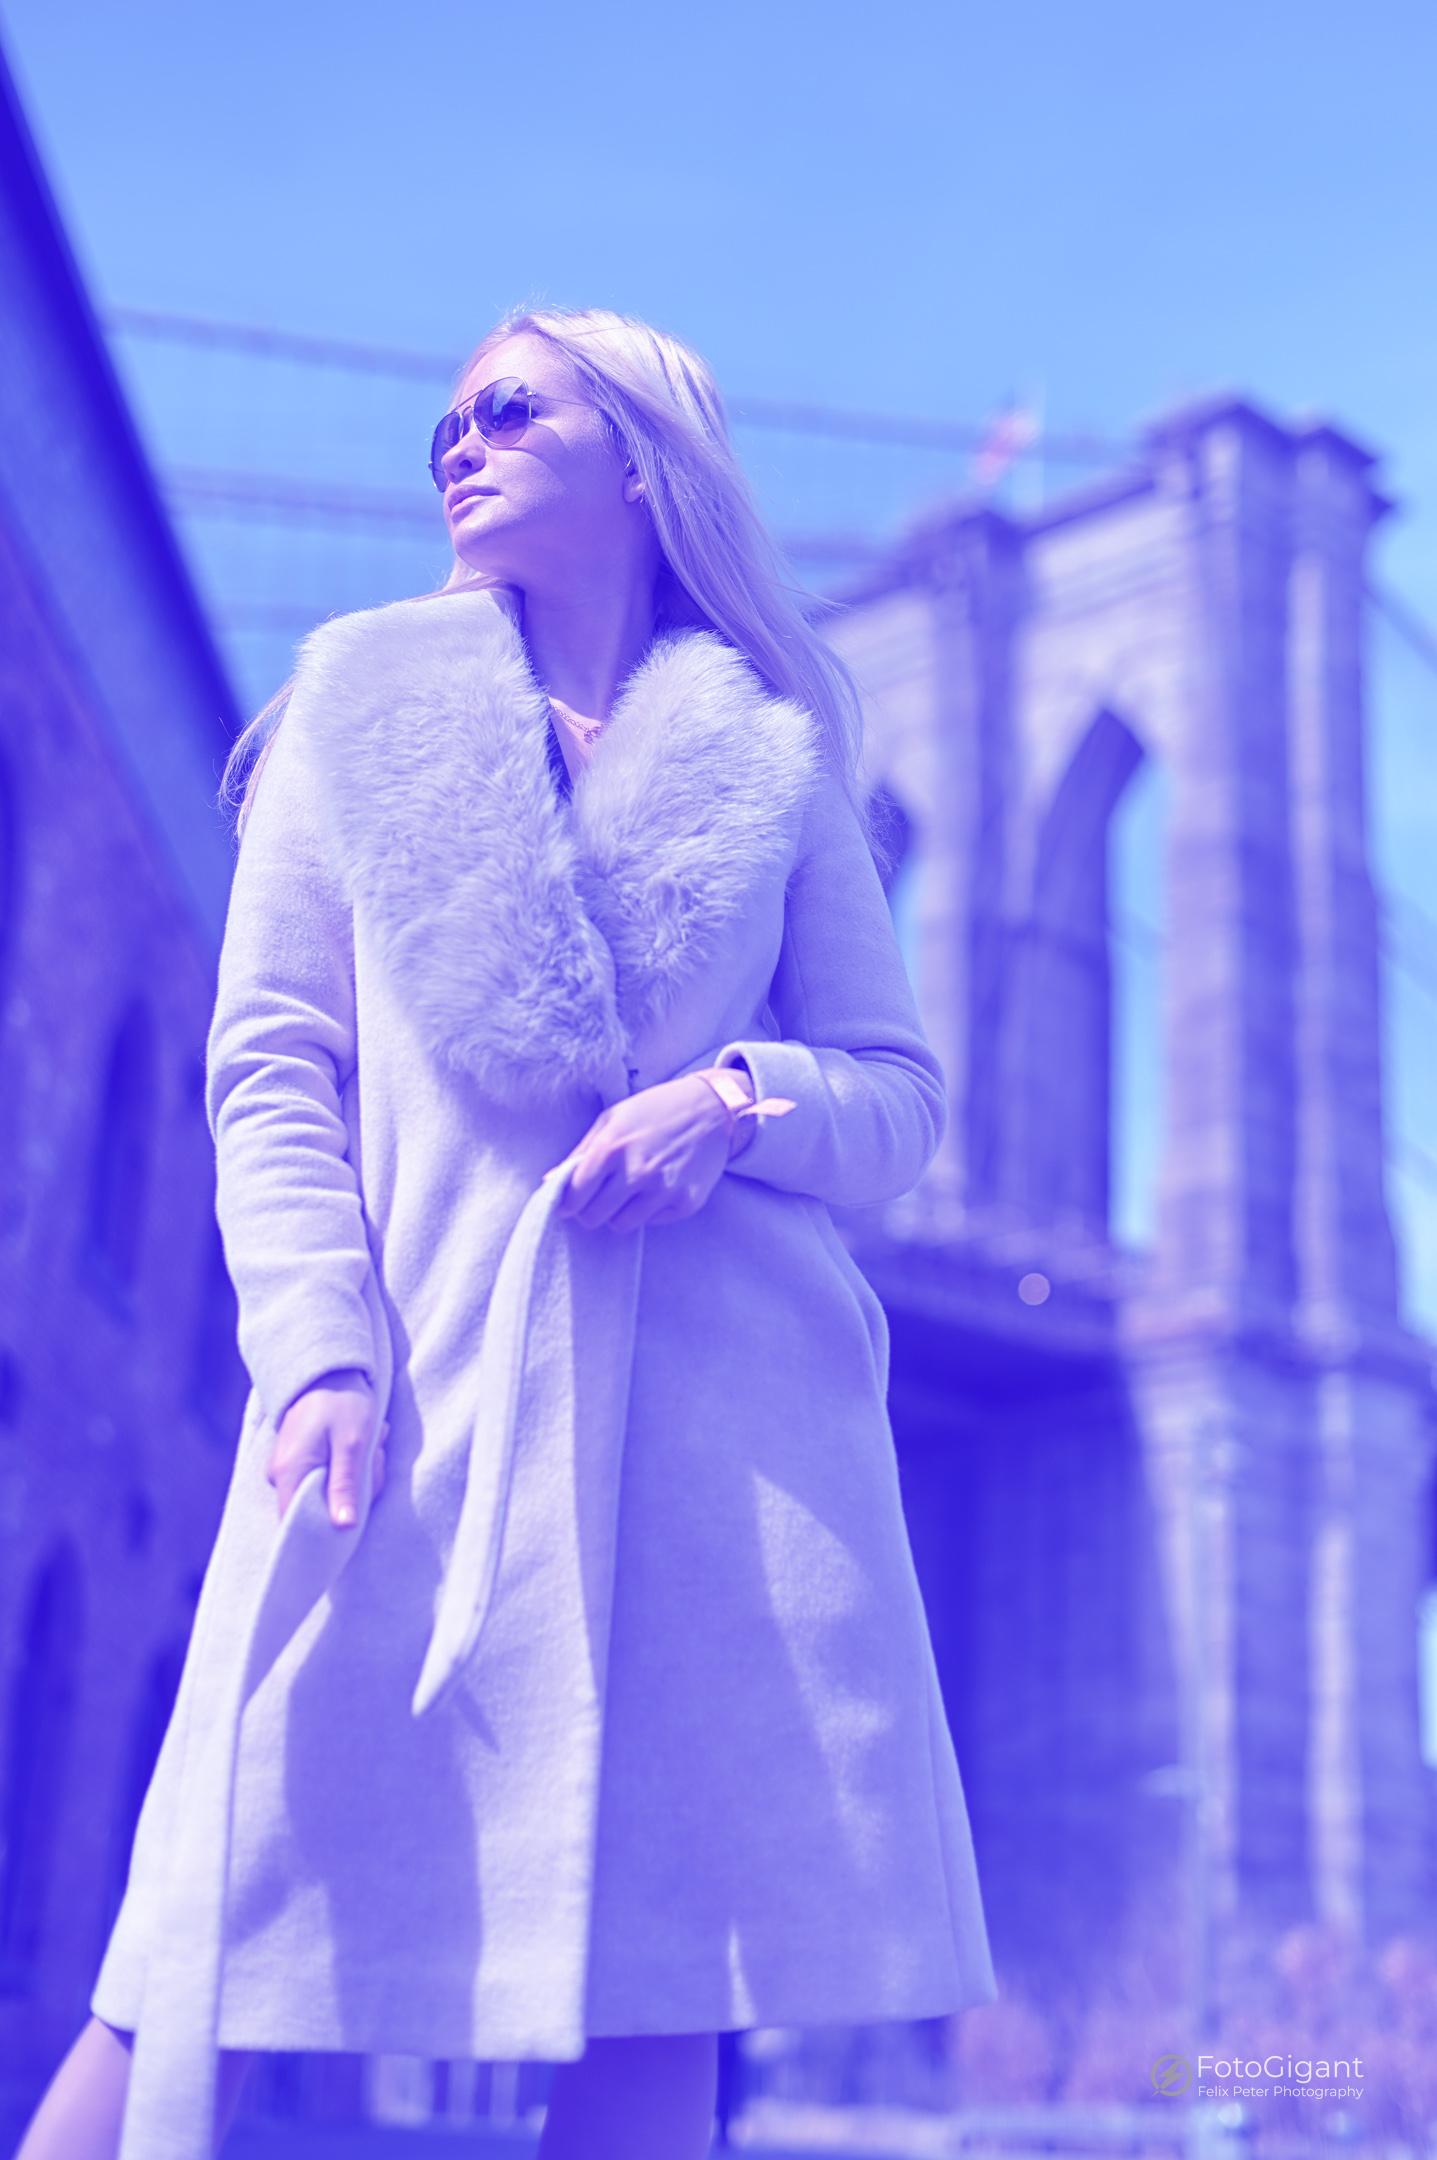 NewYork_JuliaKolomiyets_Fashionphotography_20.jpg